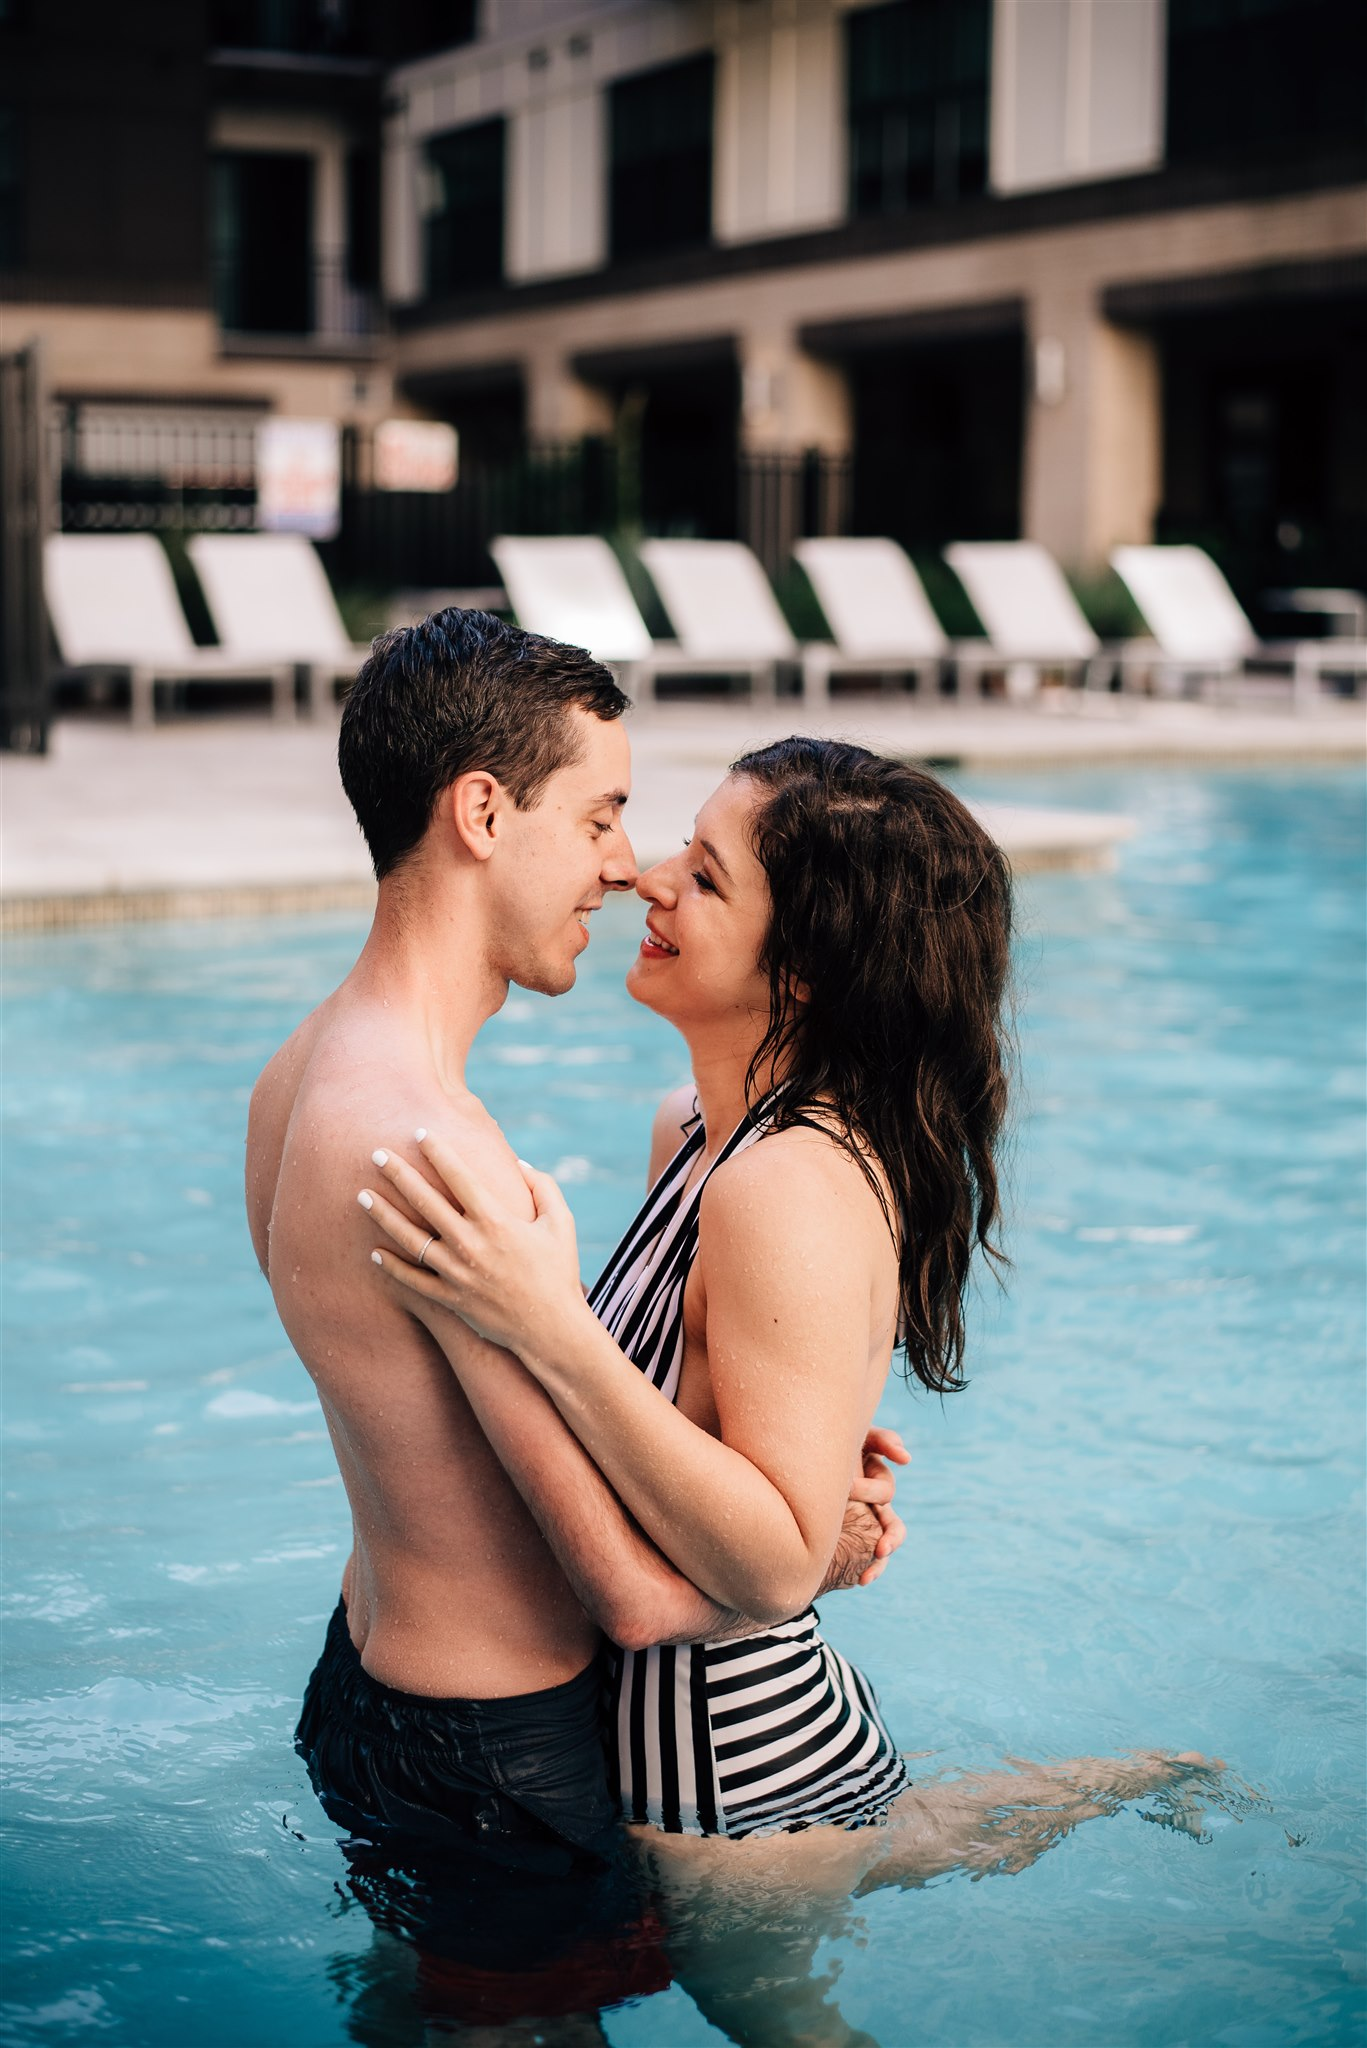 Raleigh Engagement Photographer - Raleigh Wedding Photographer - North Carolina Wedding Photographer - Pool Engagement Session - Pool Couple Session